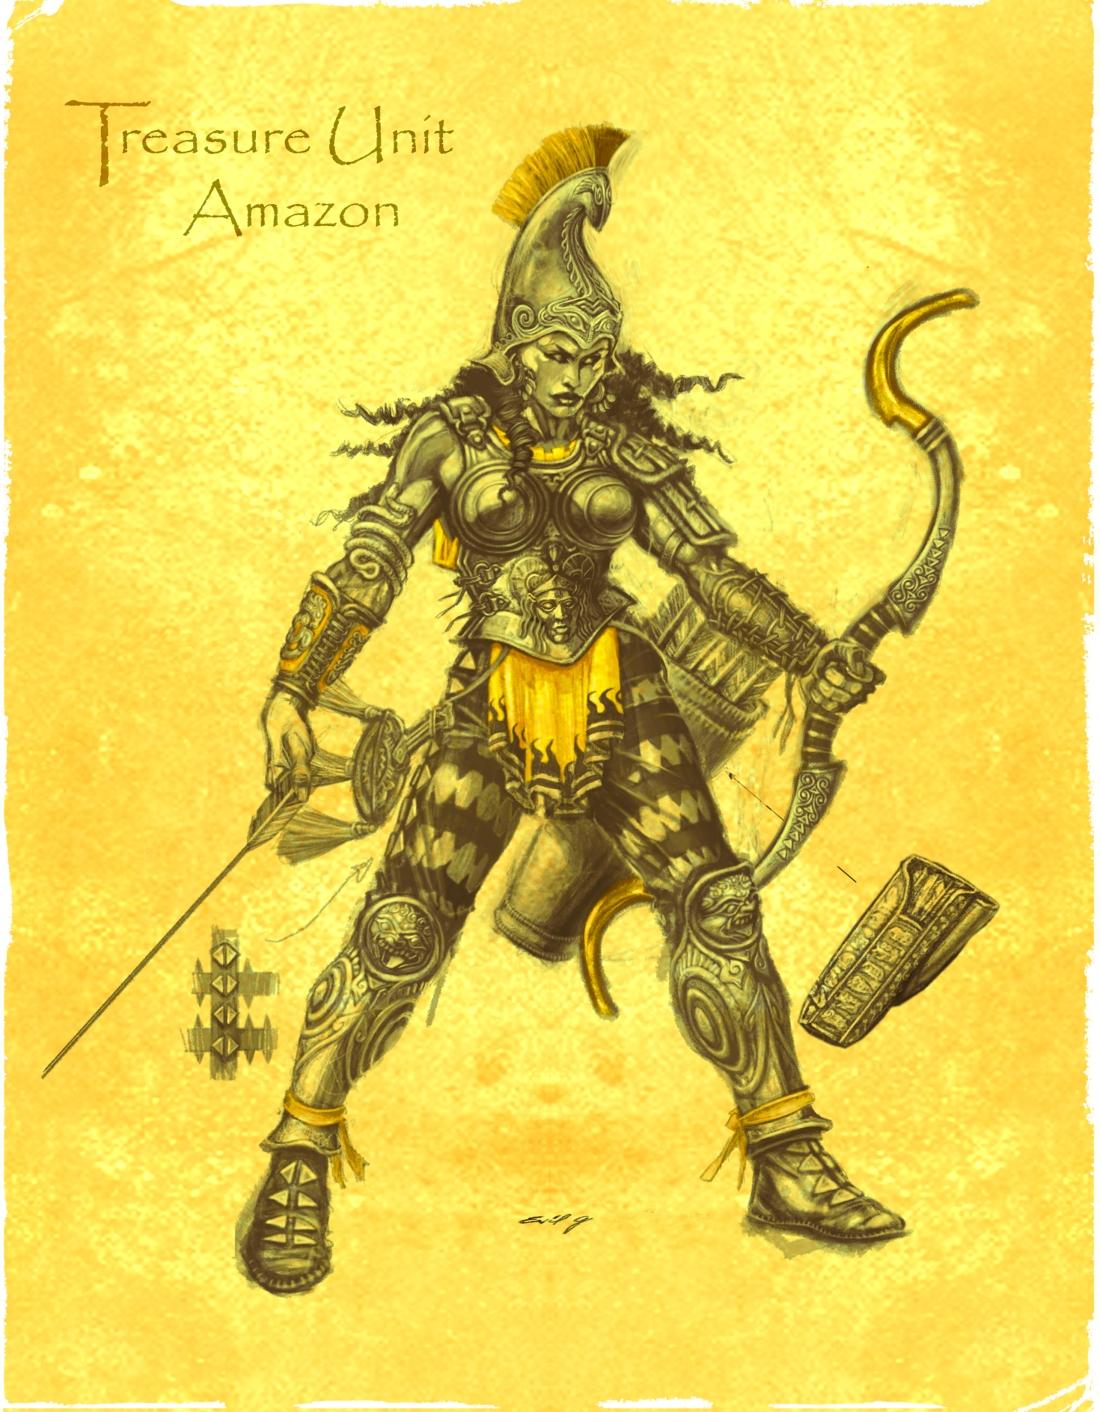 Gary_Freeman_Concept_Art_Amazon2